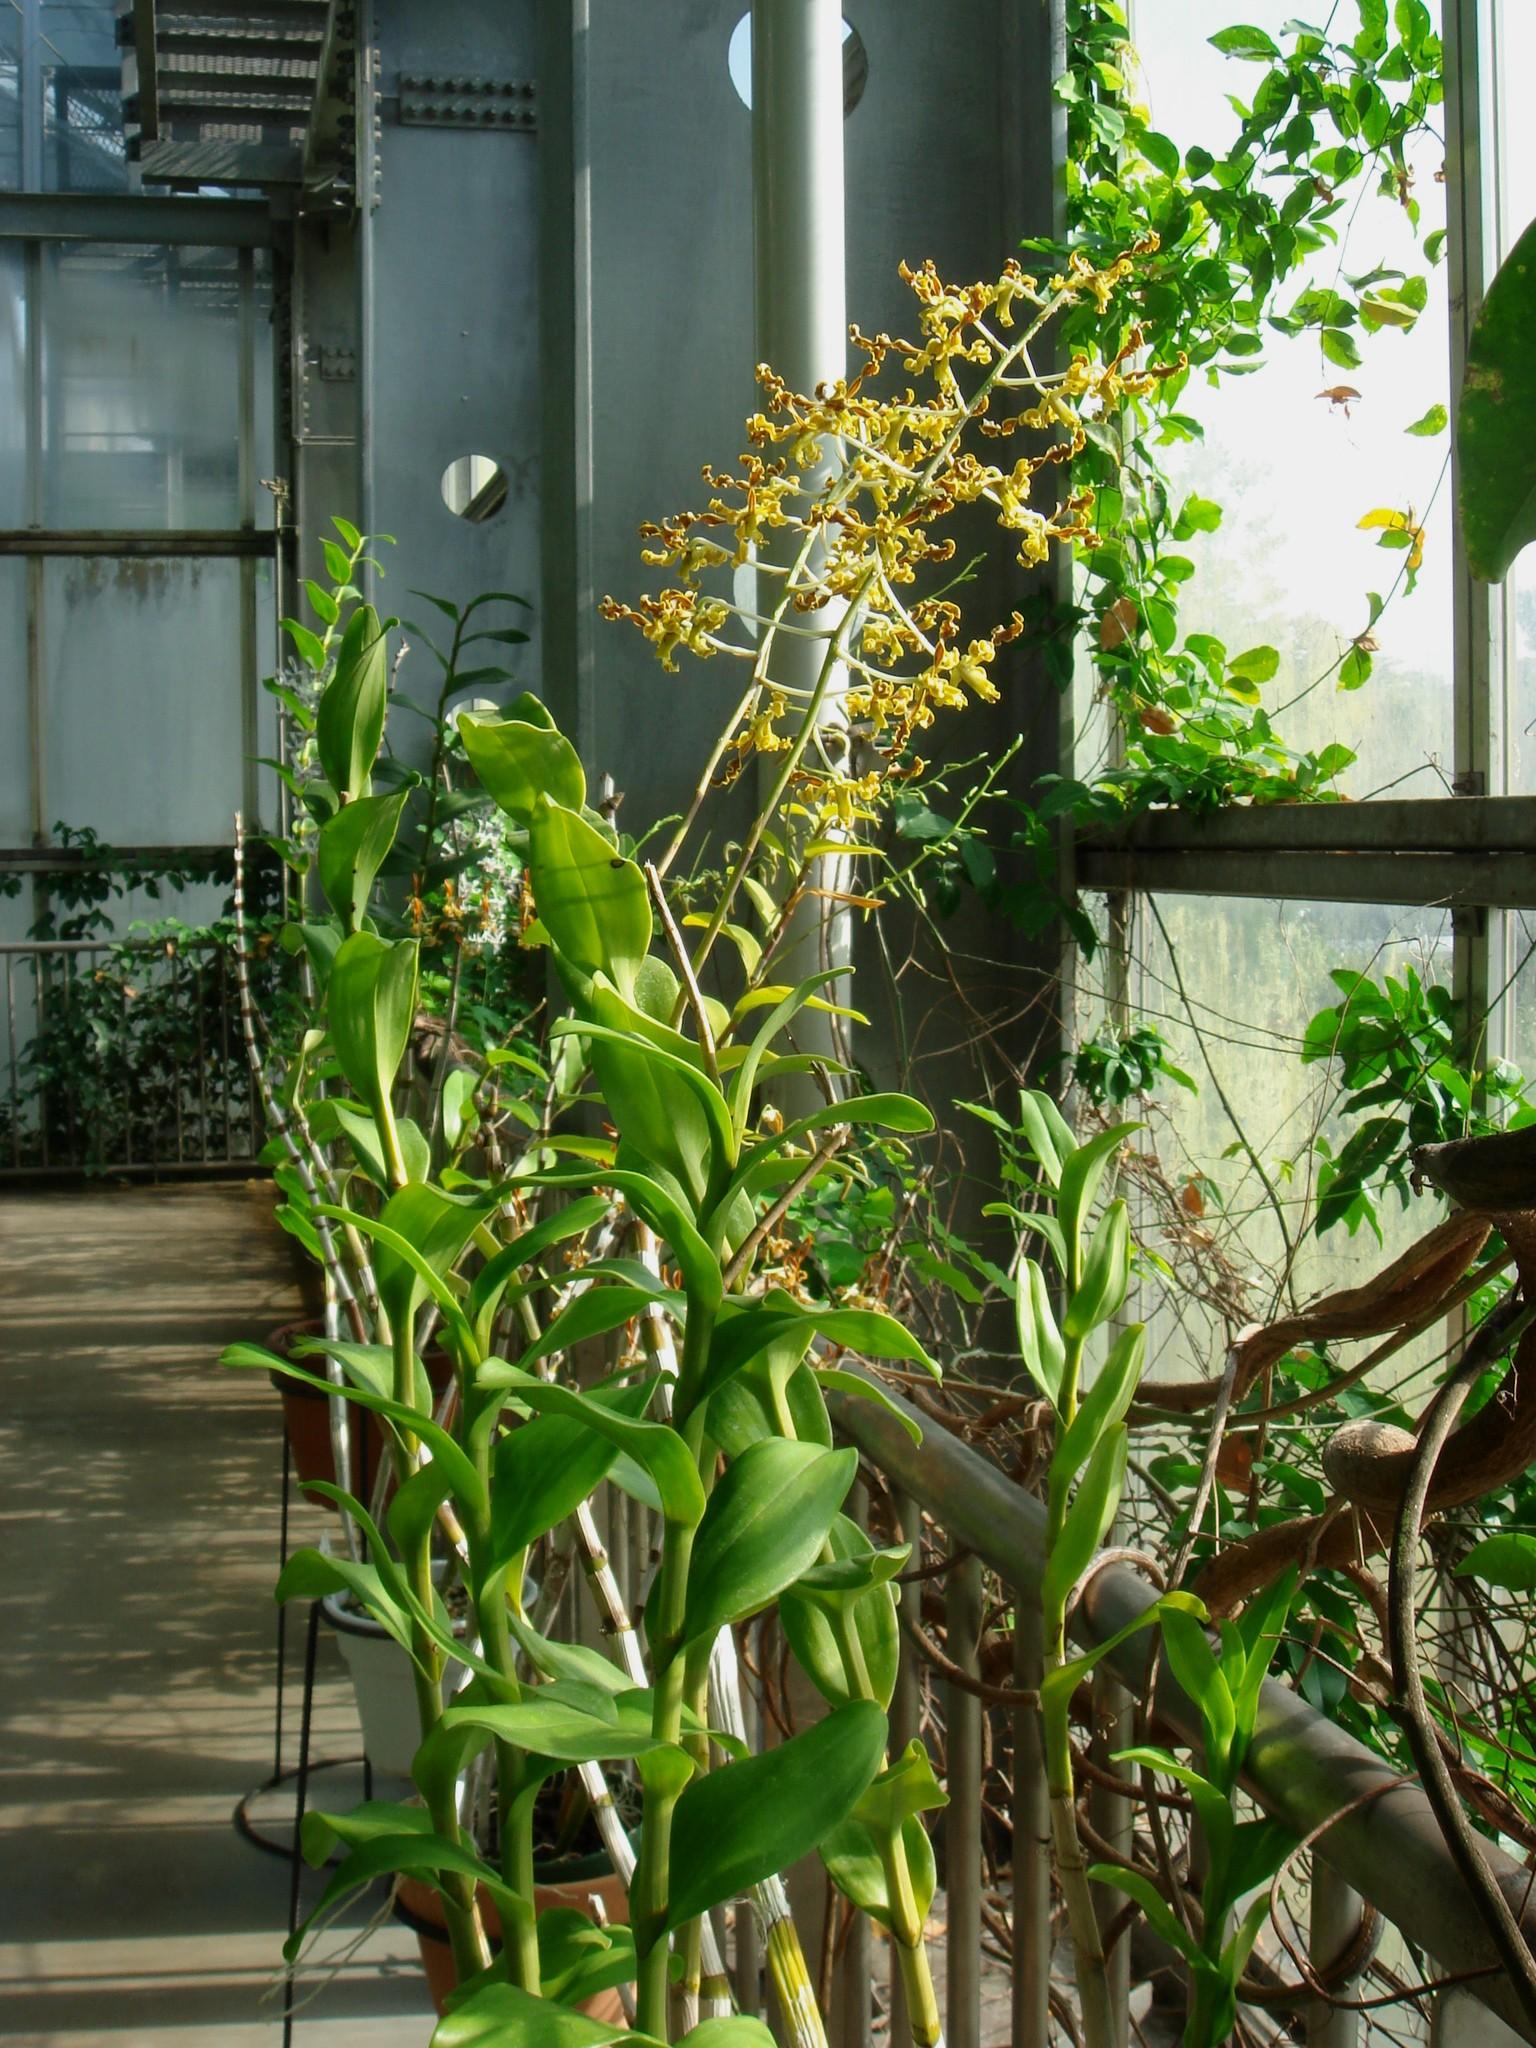 http://orchids.la.coocan.jp/Dendrobium/Dendrobium%20discolor/DSC08464.JPG